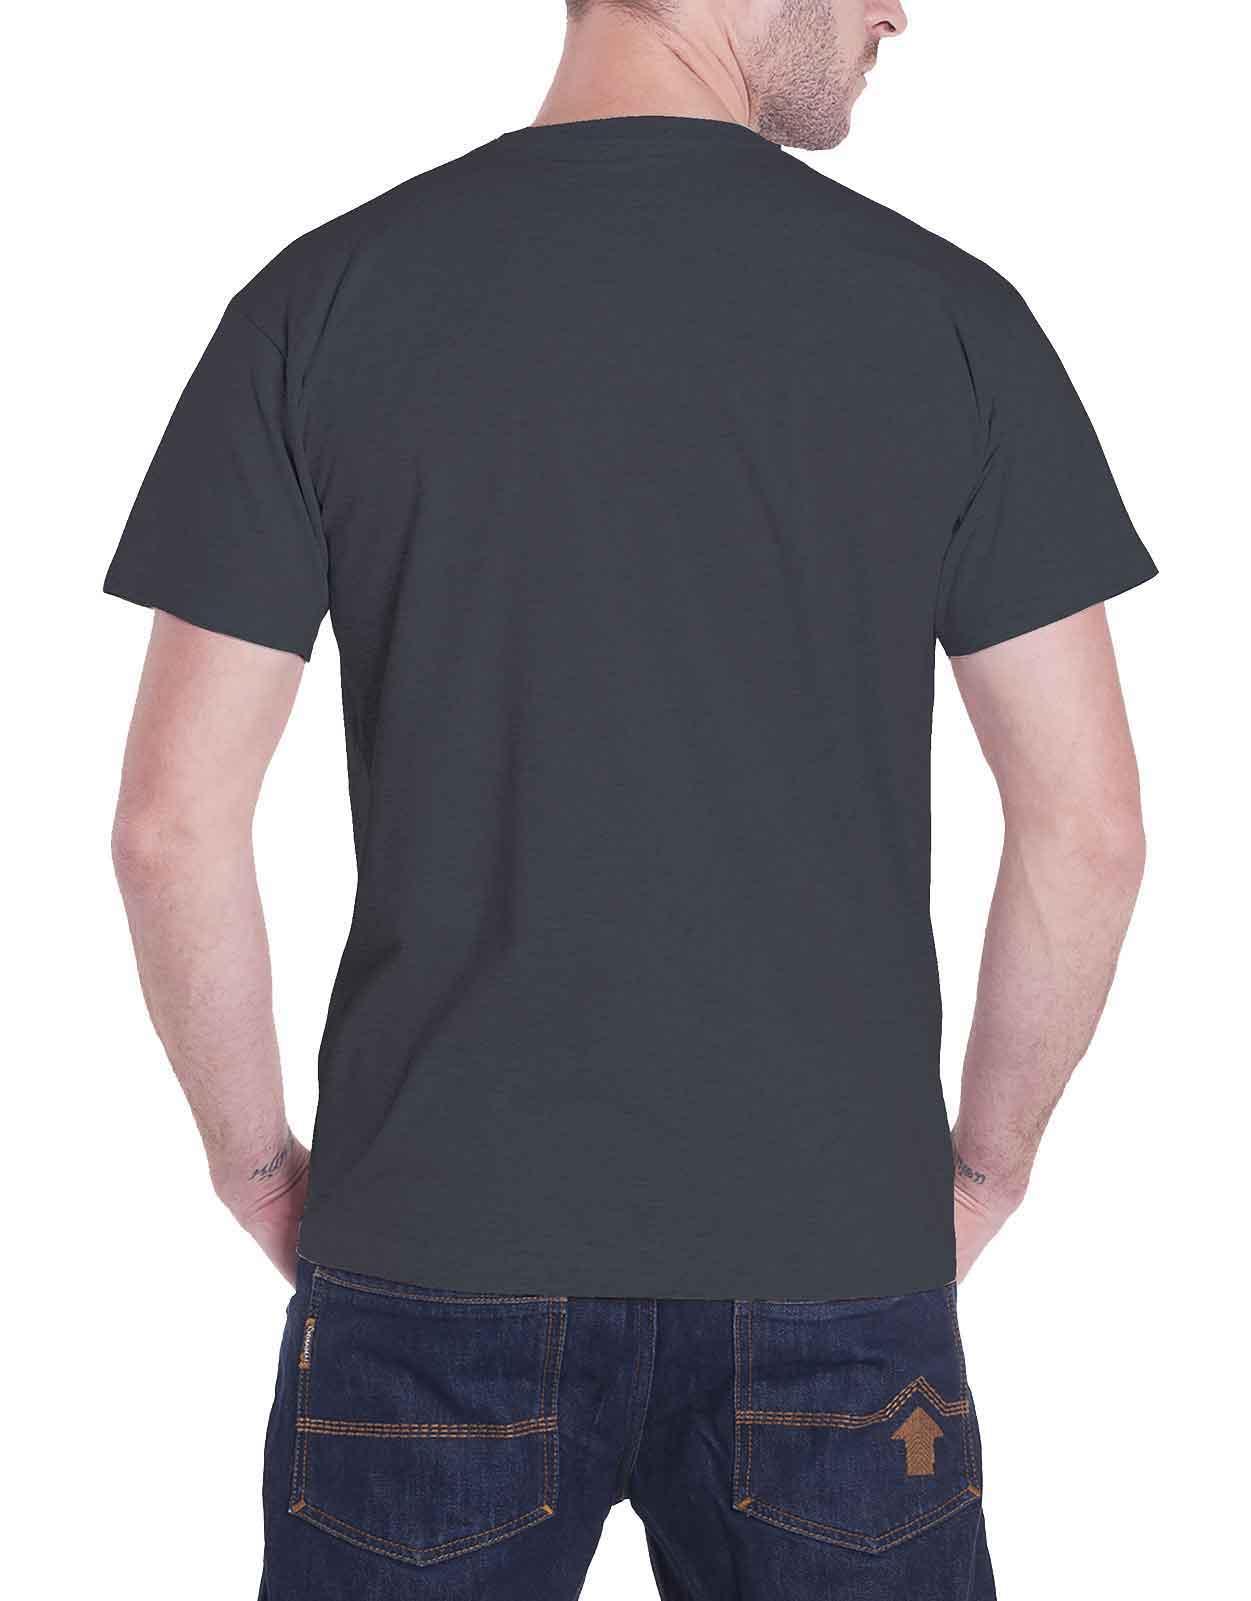 Officiel-Harry-Potter-T-Shirt-Poudlard-Gryffondor-Poufsouffle-cretes-Homme-NEUF miniature 43